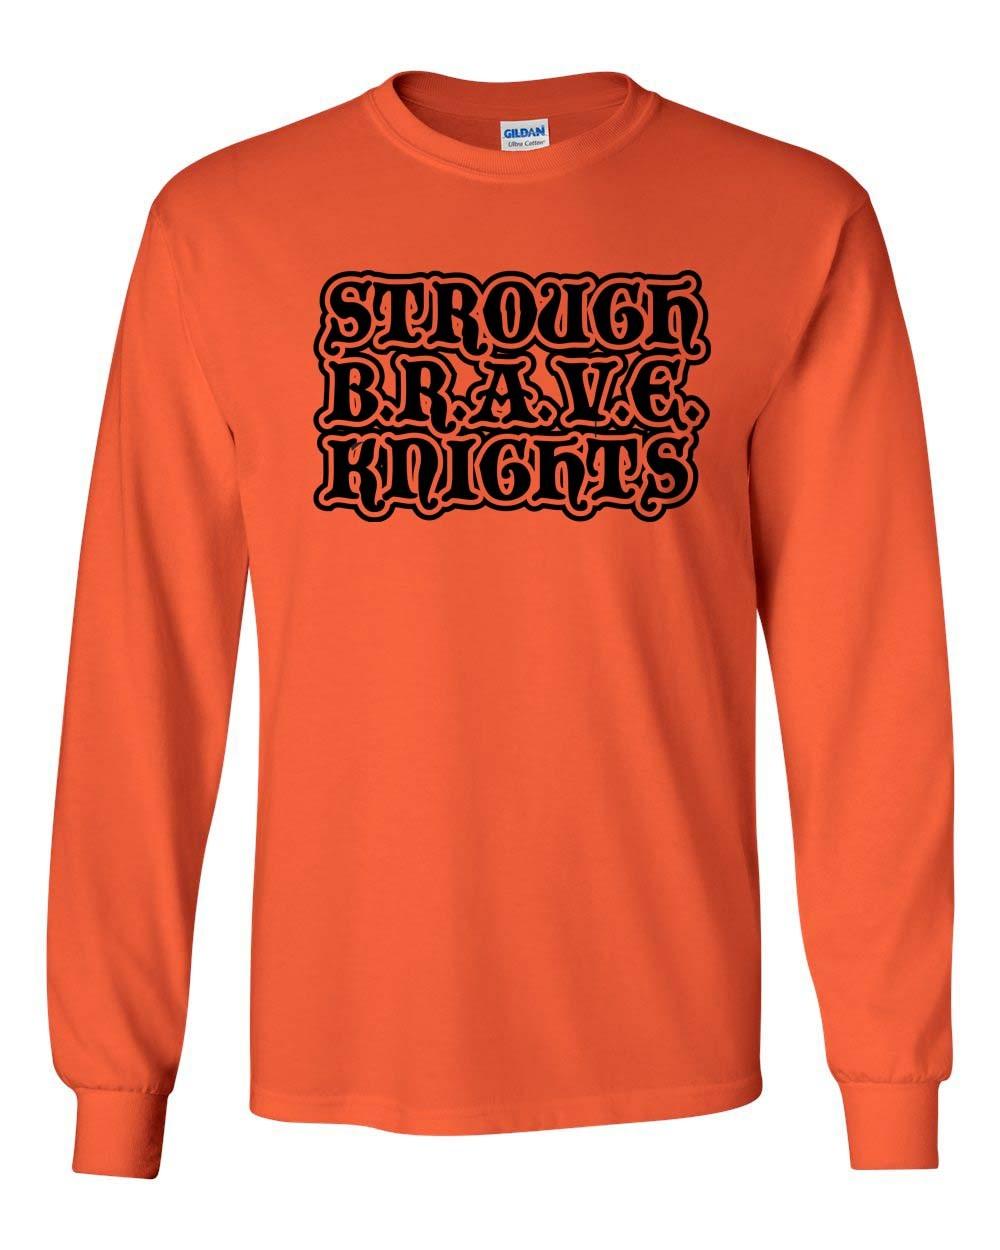 B.R.A.V.E. Knights Long Sleeve Tee